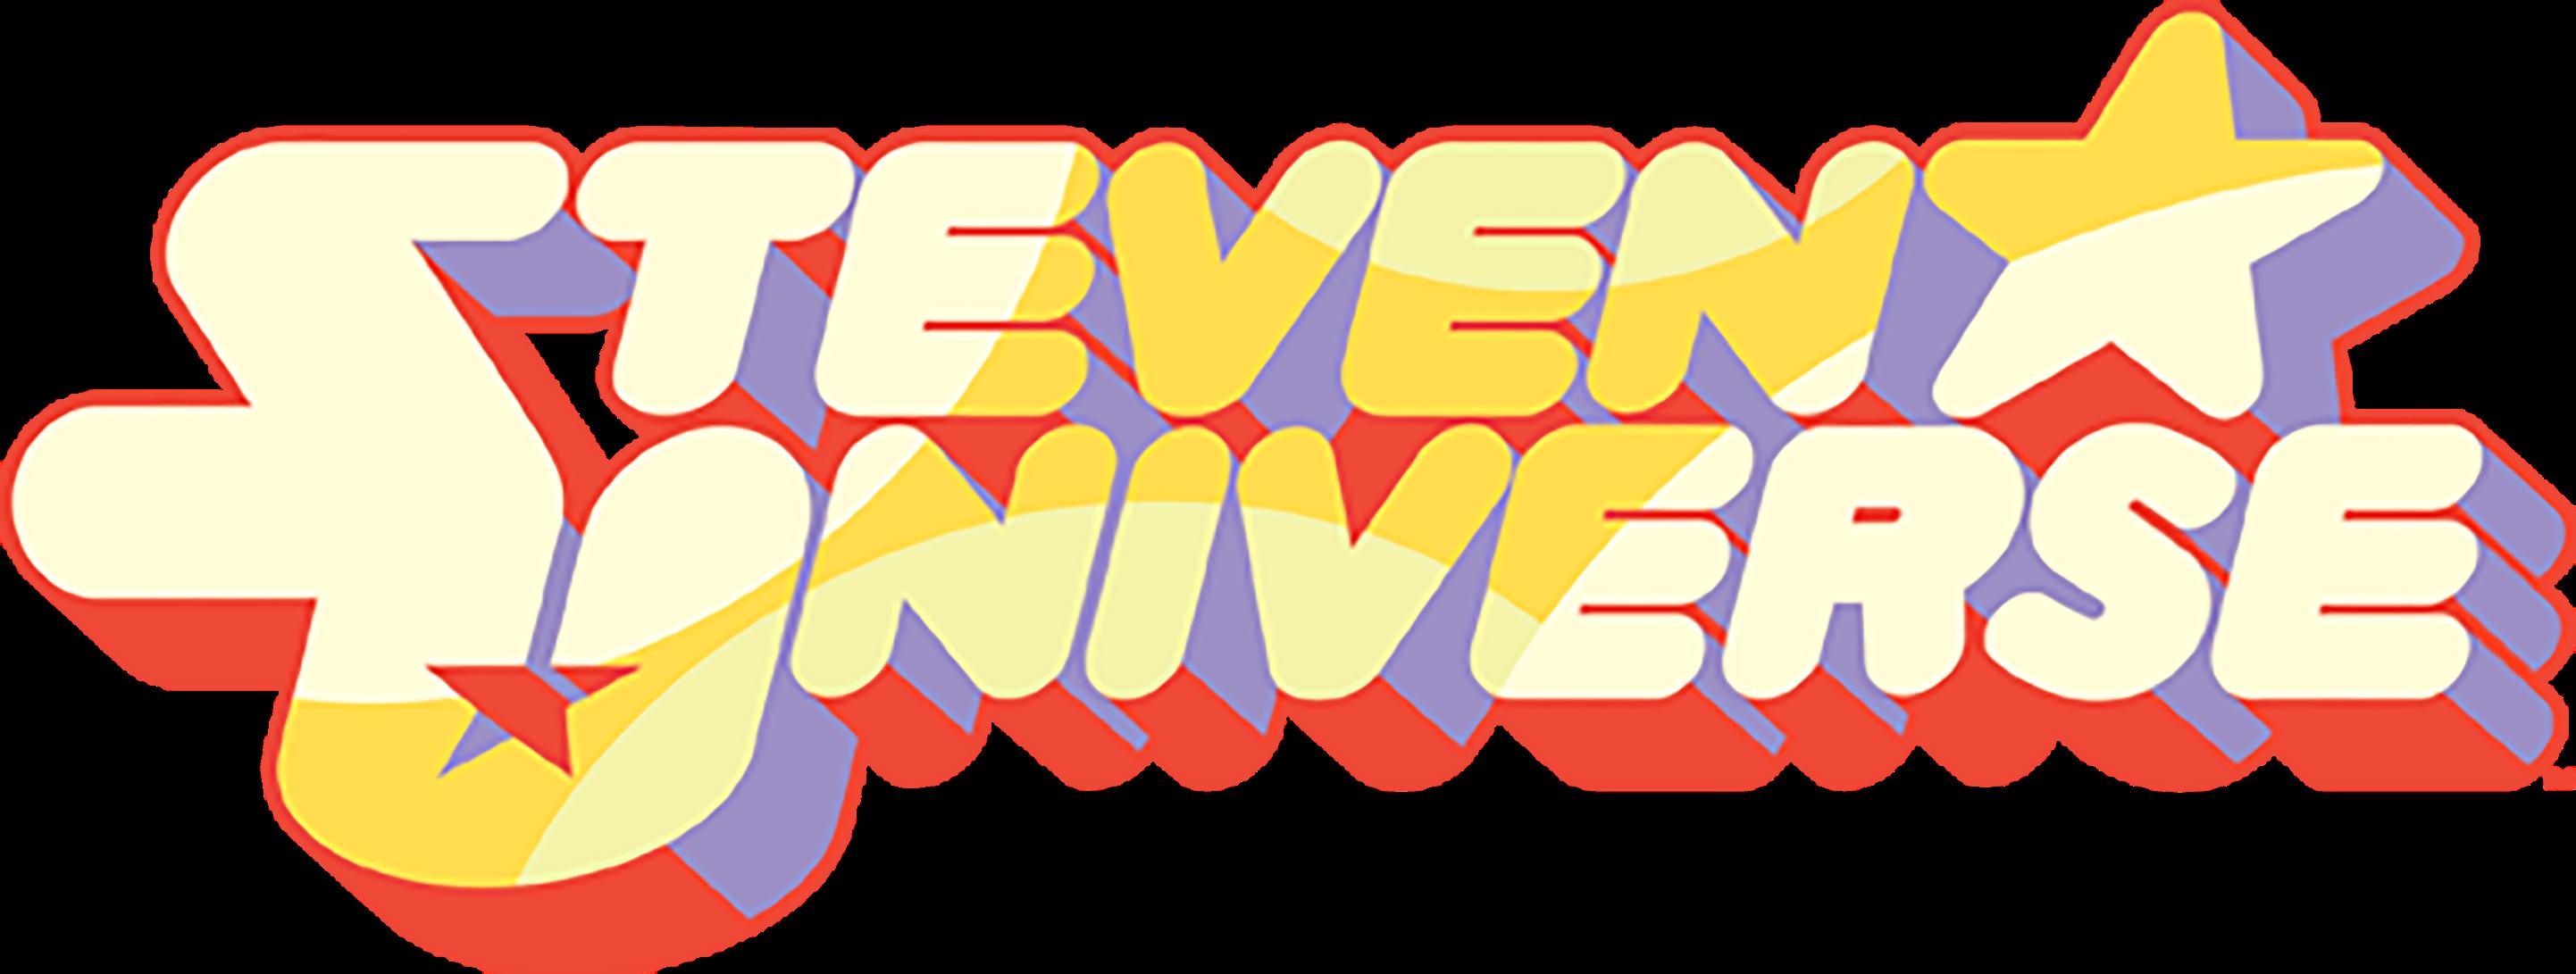 Steven Universe Logo Steven Universe Characters Steven Universe Steven Universe Ukulele